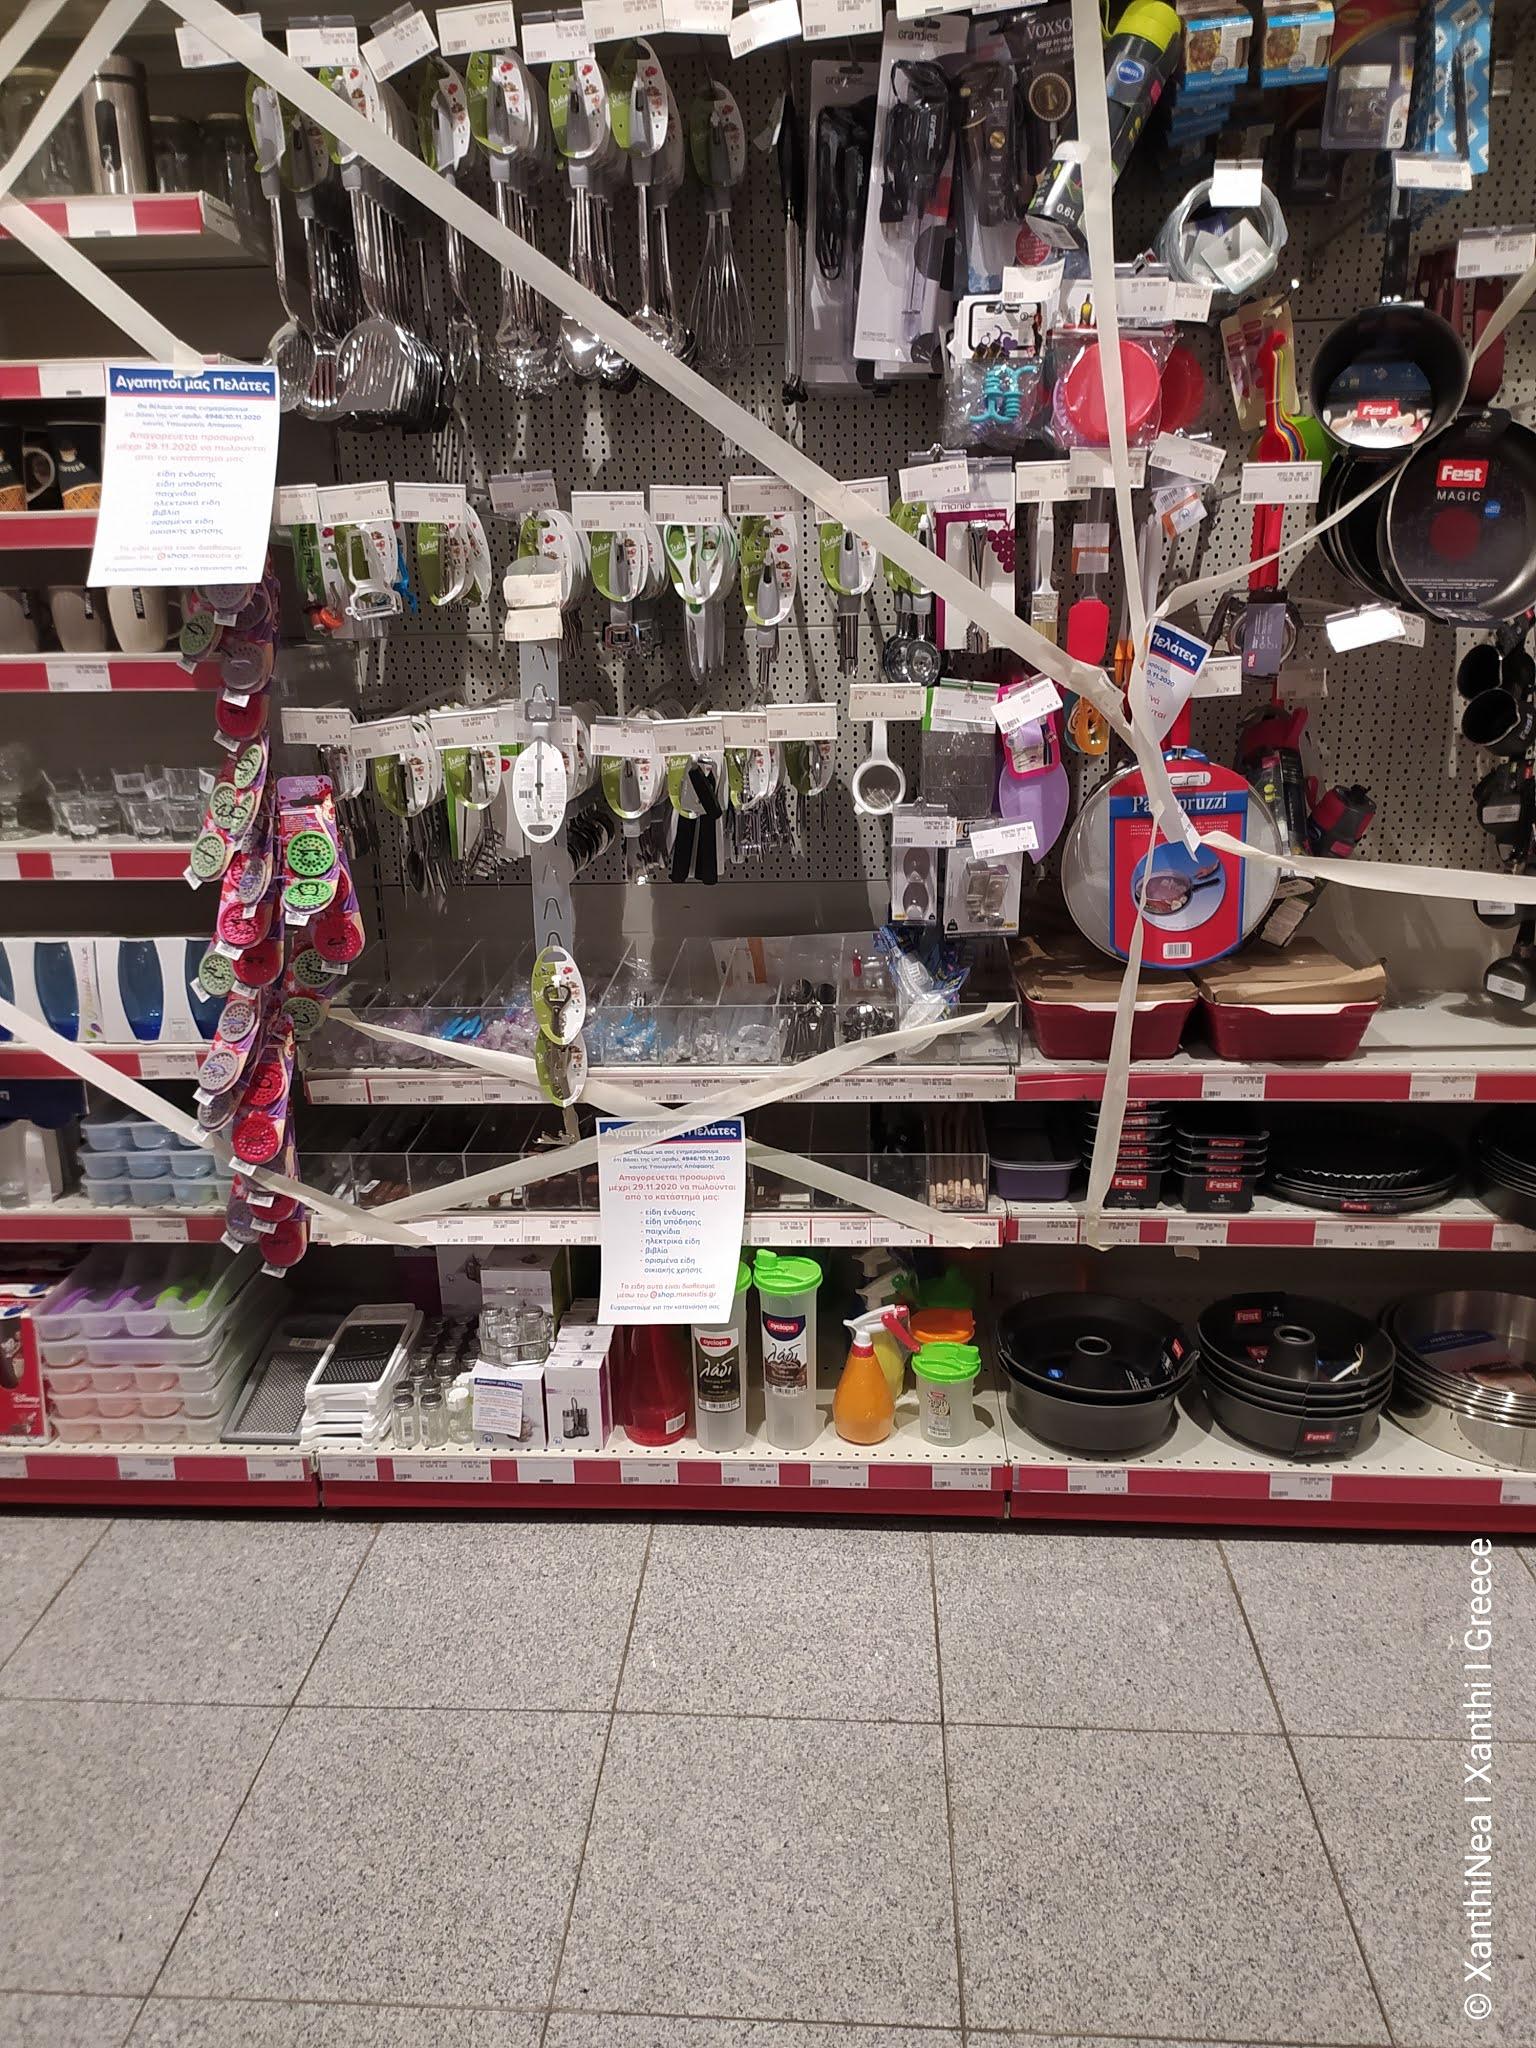 Lockdown: Πώς θα λειτουργούν τα σούπερ μάρκετ στην Ξάνθη